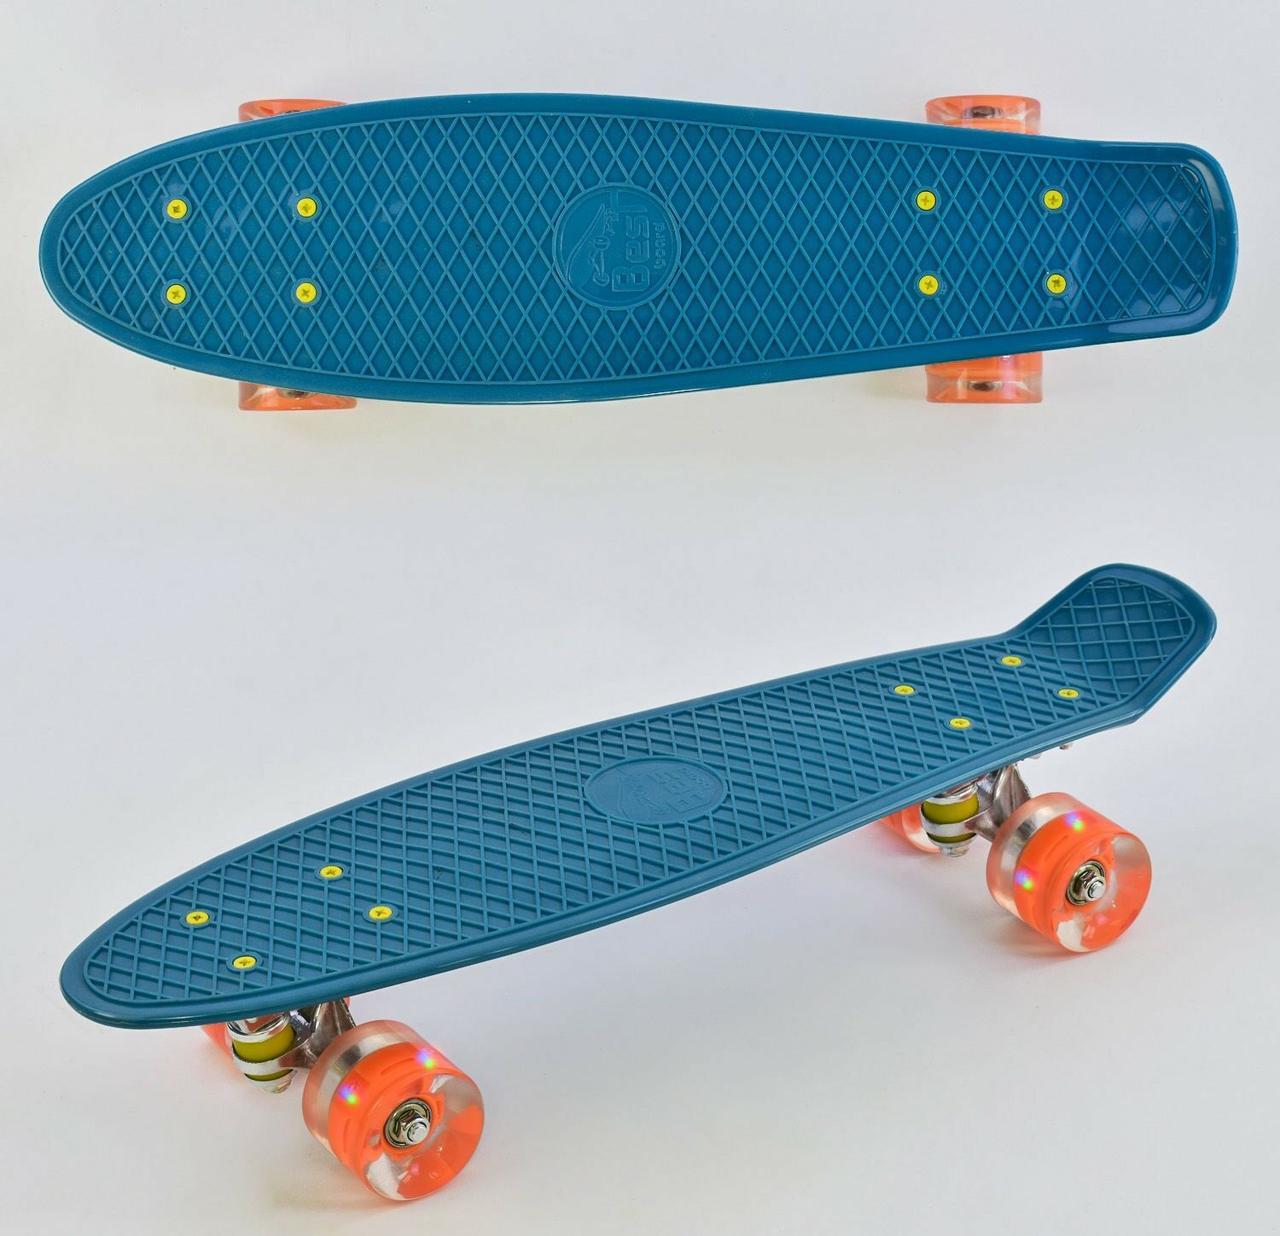 Скейт Пенни борд Best Board 3030 бирюзовый, доска 55 см, колёса PU, светятся